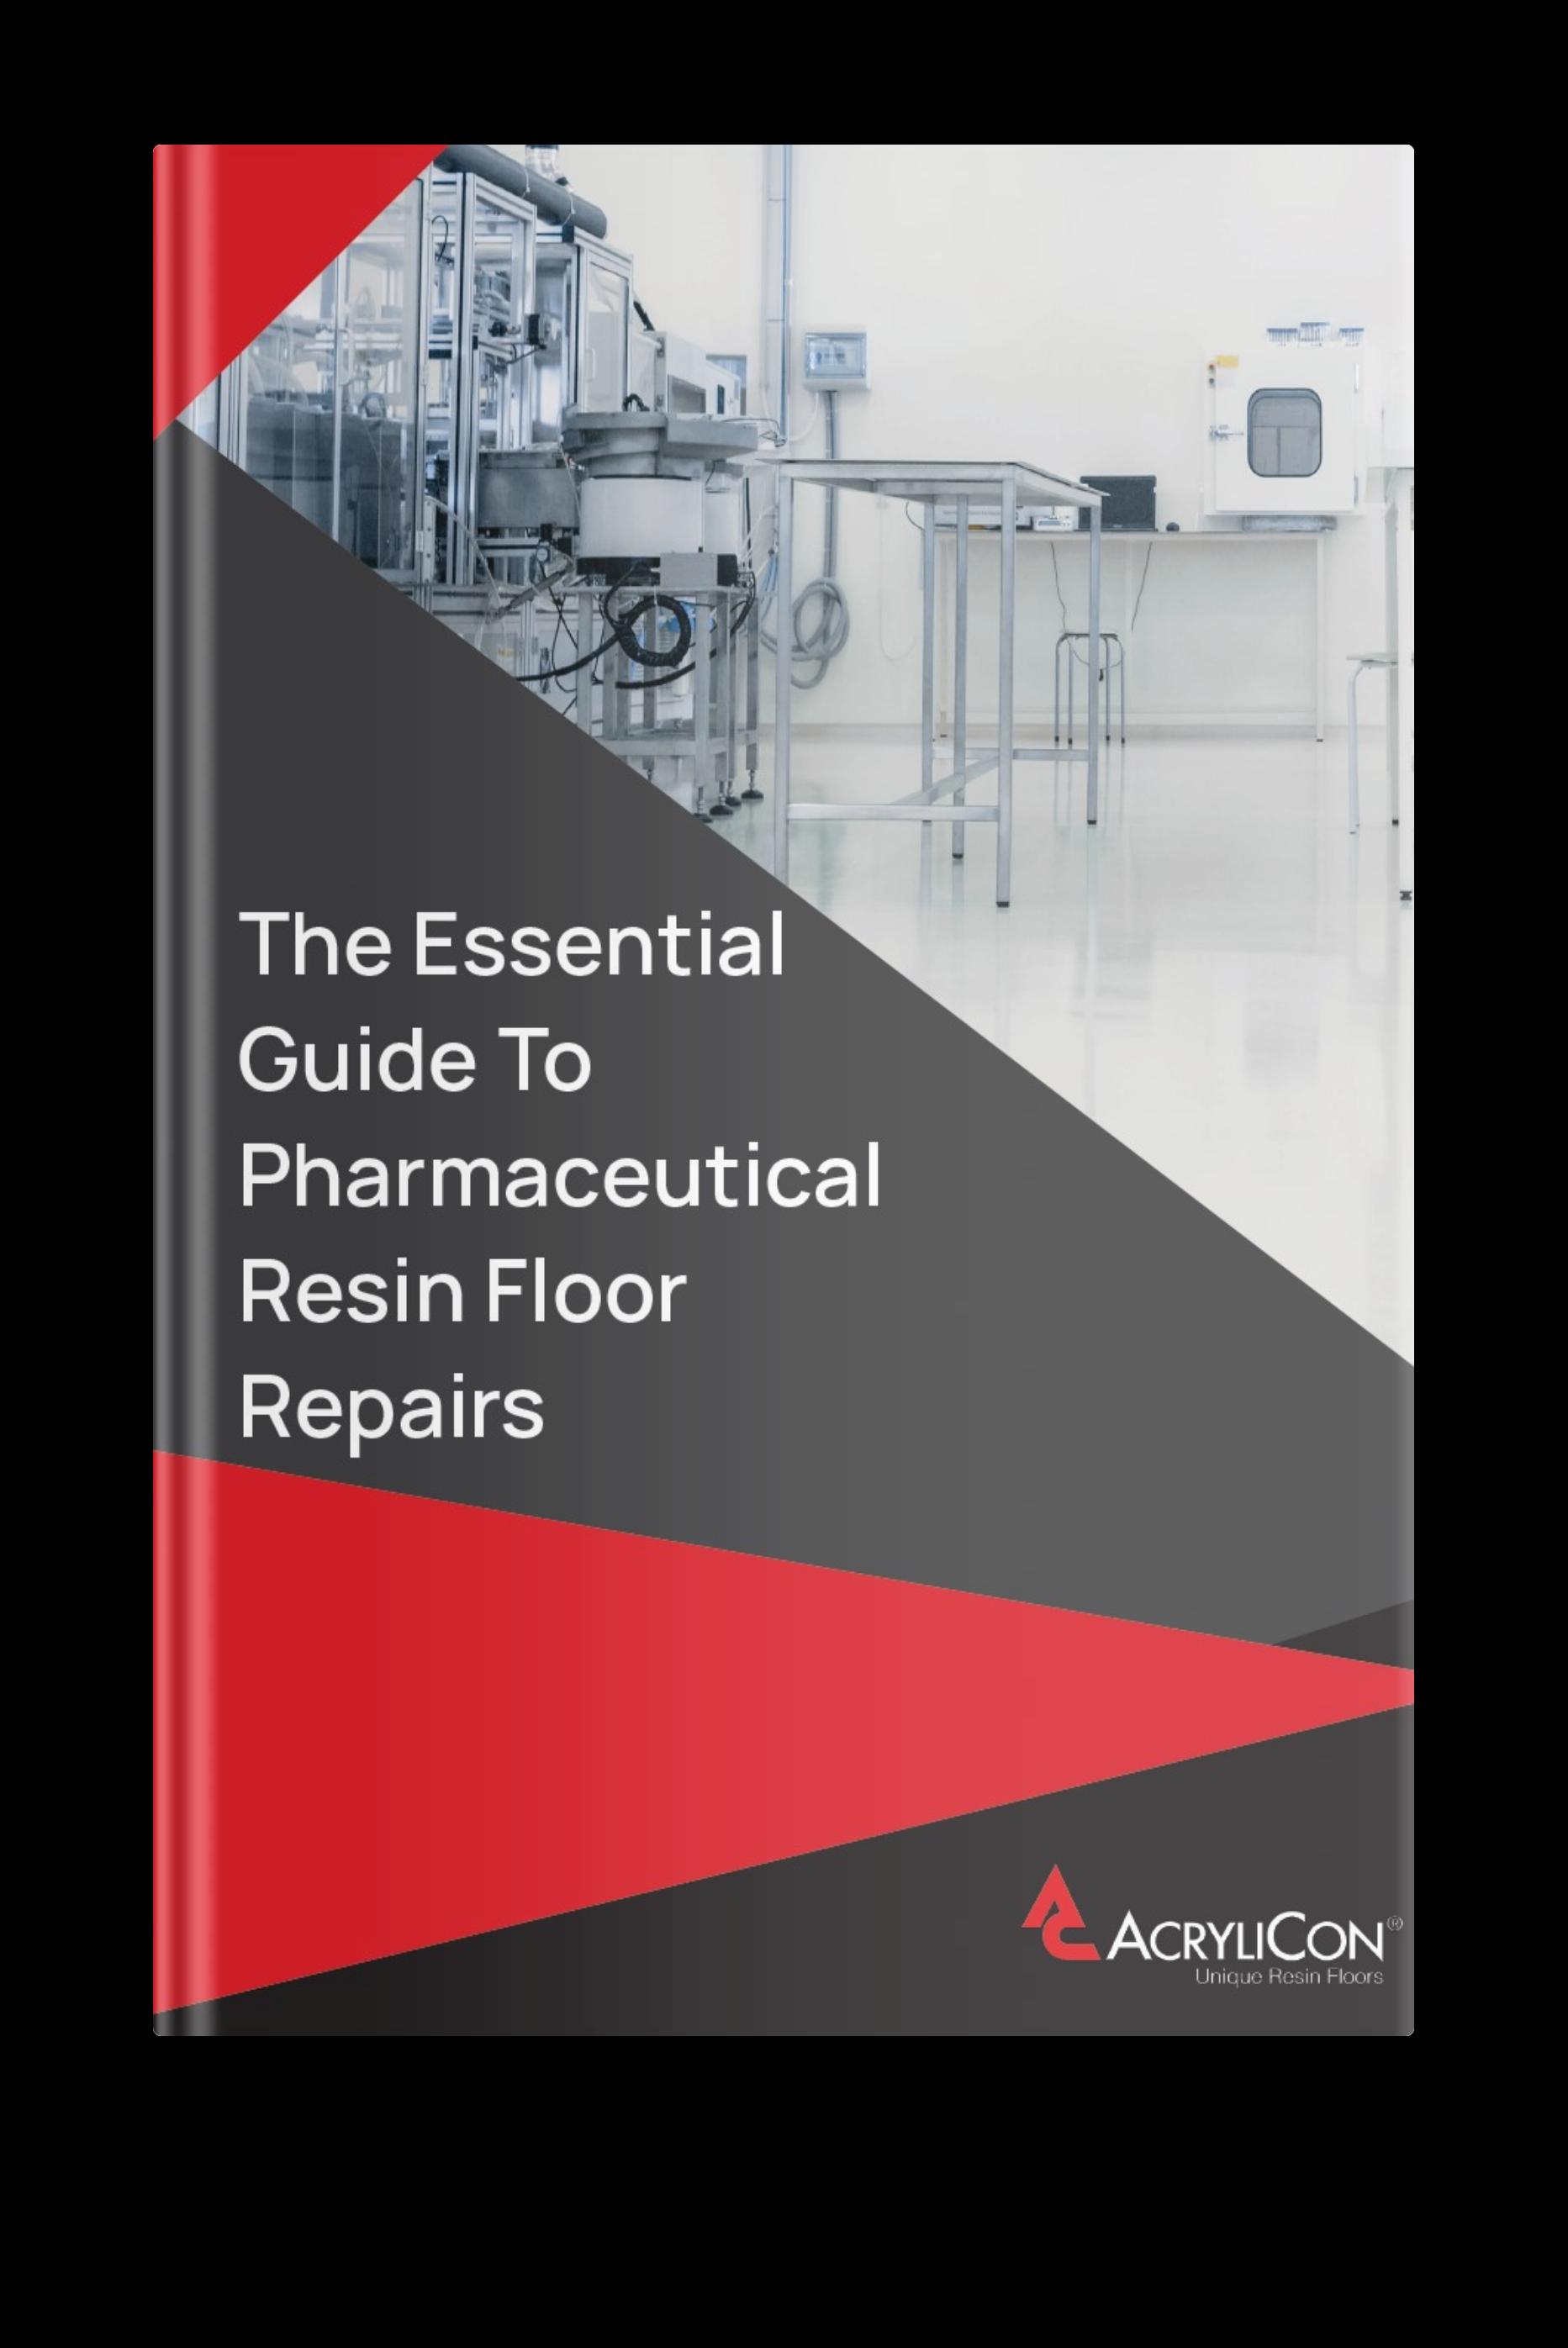 The Essential Guide To Pharmaceutical Floor Repairs